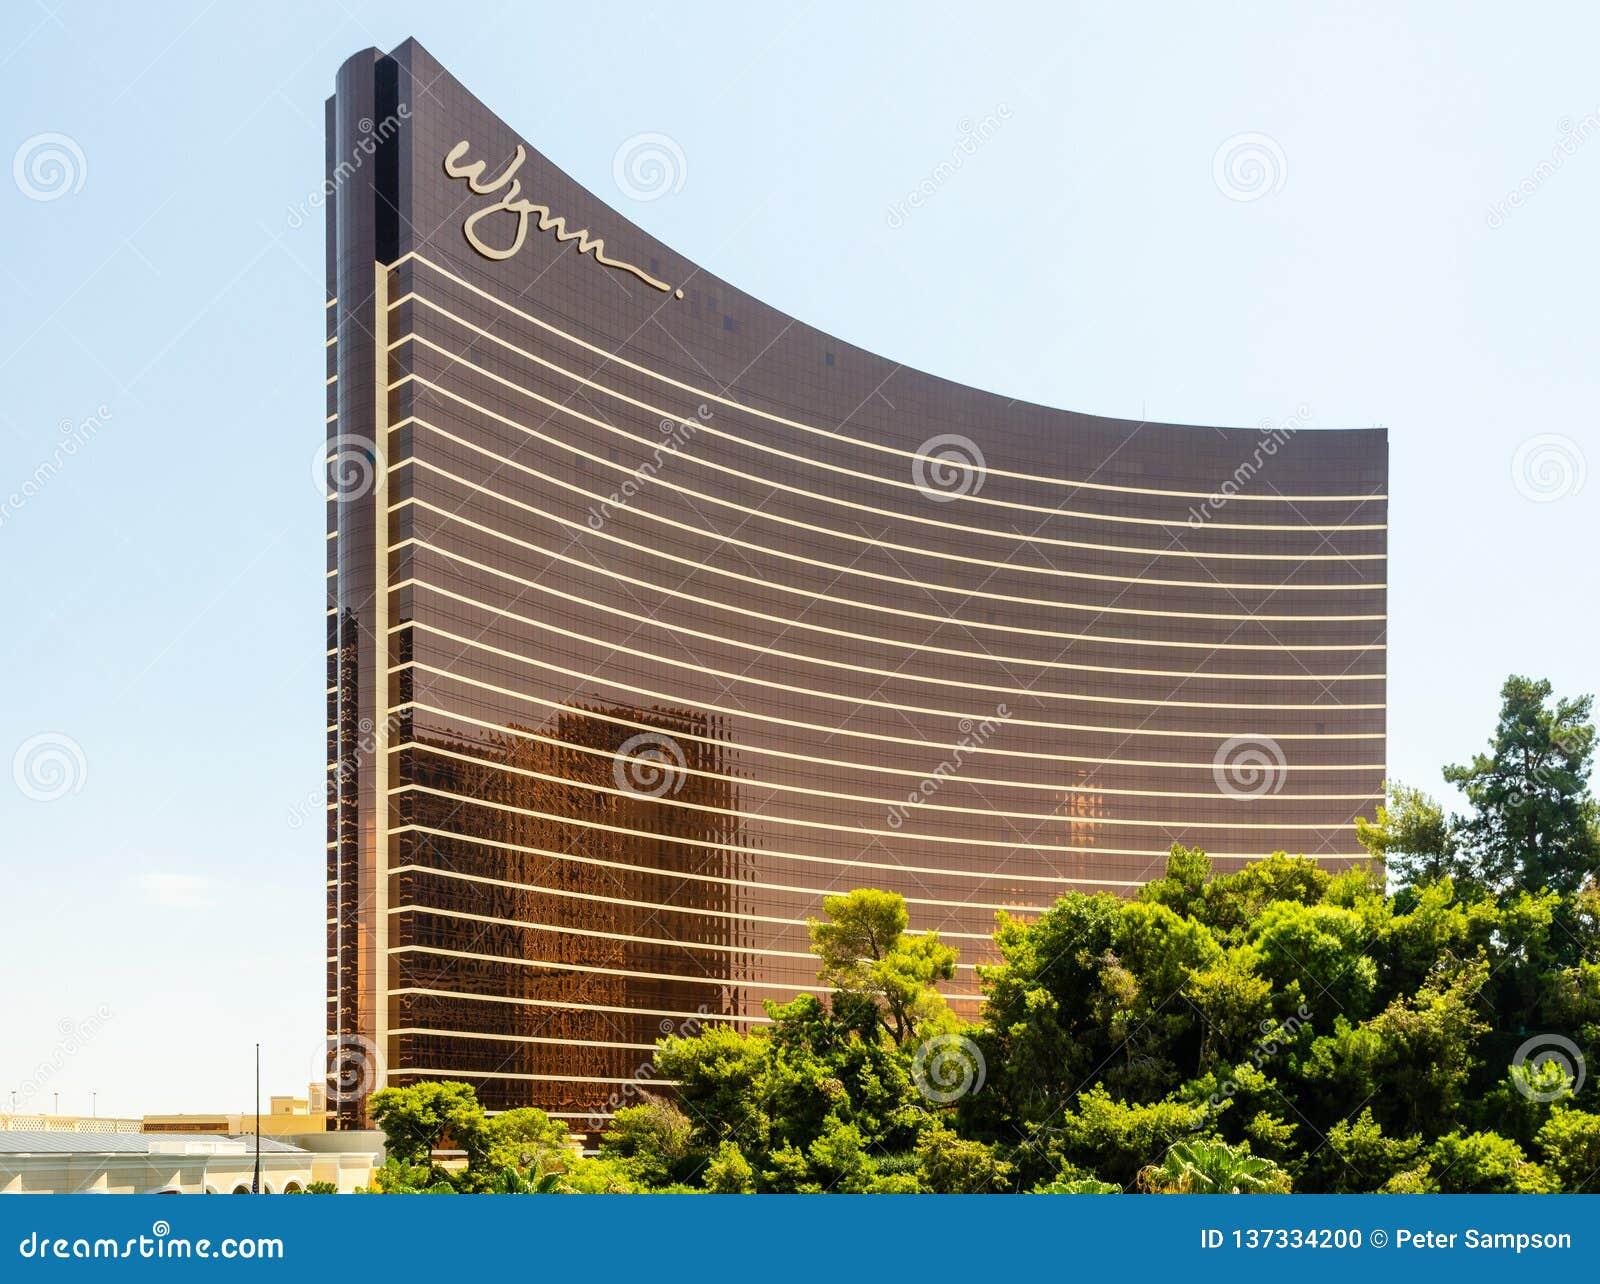 Wynn Las Vegas Building in Las Vegas